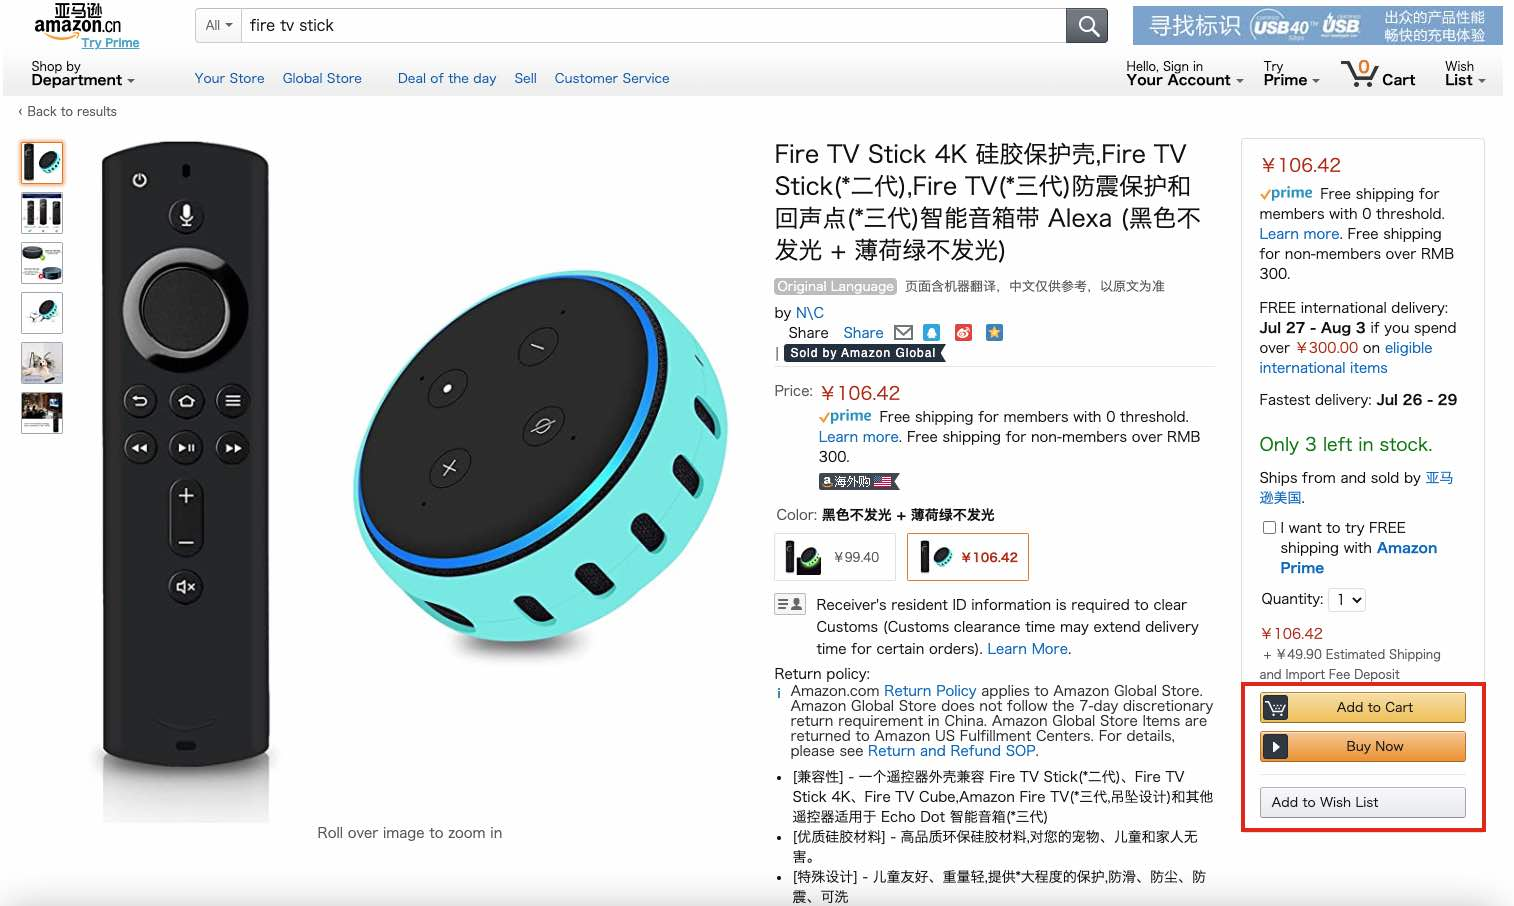 Amazon Fire TV Stick bestellen